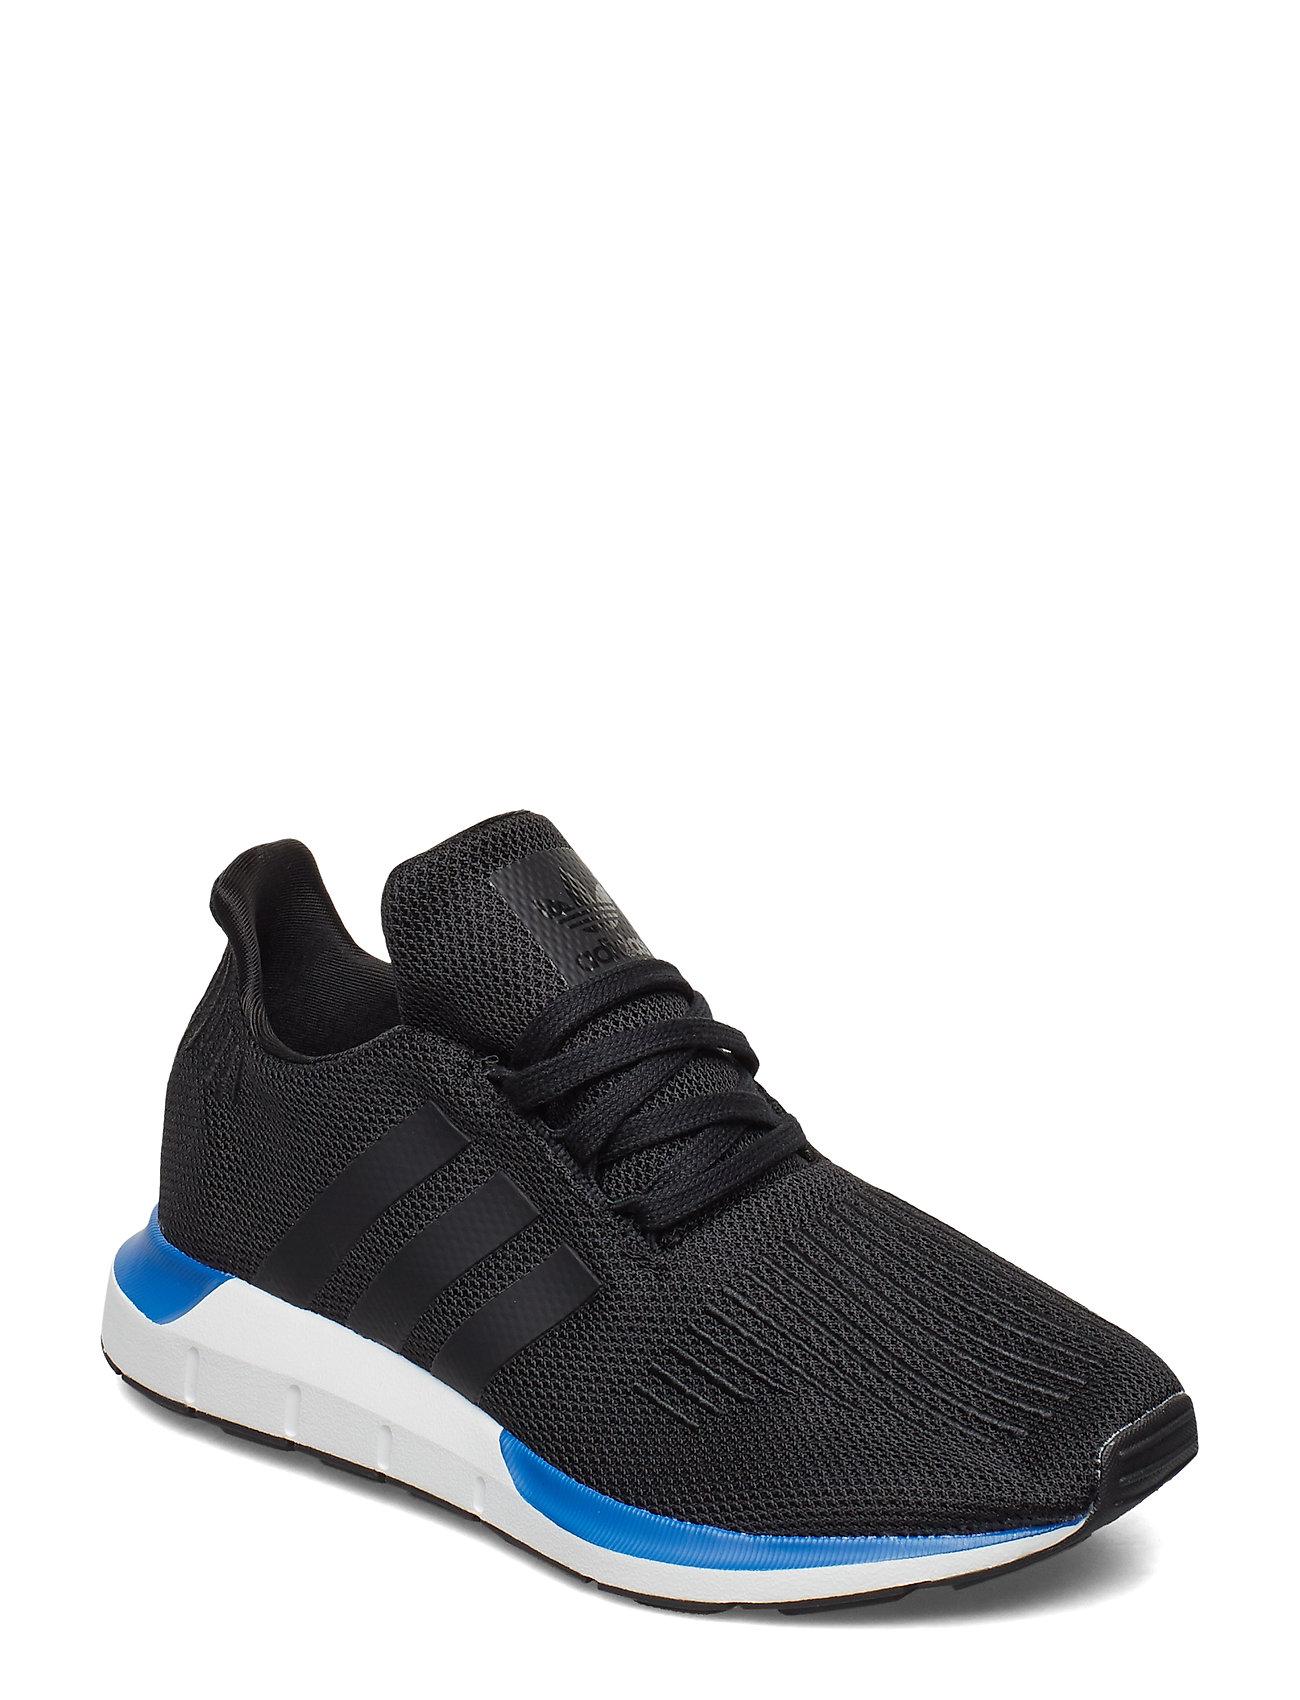 adidas Originals SWIFT RUN J - CBLACK/CBLACK/BLUE